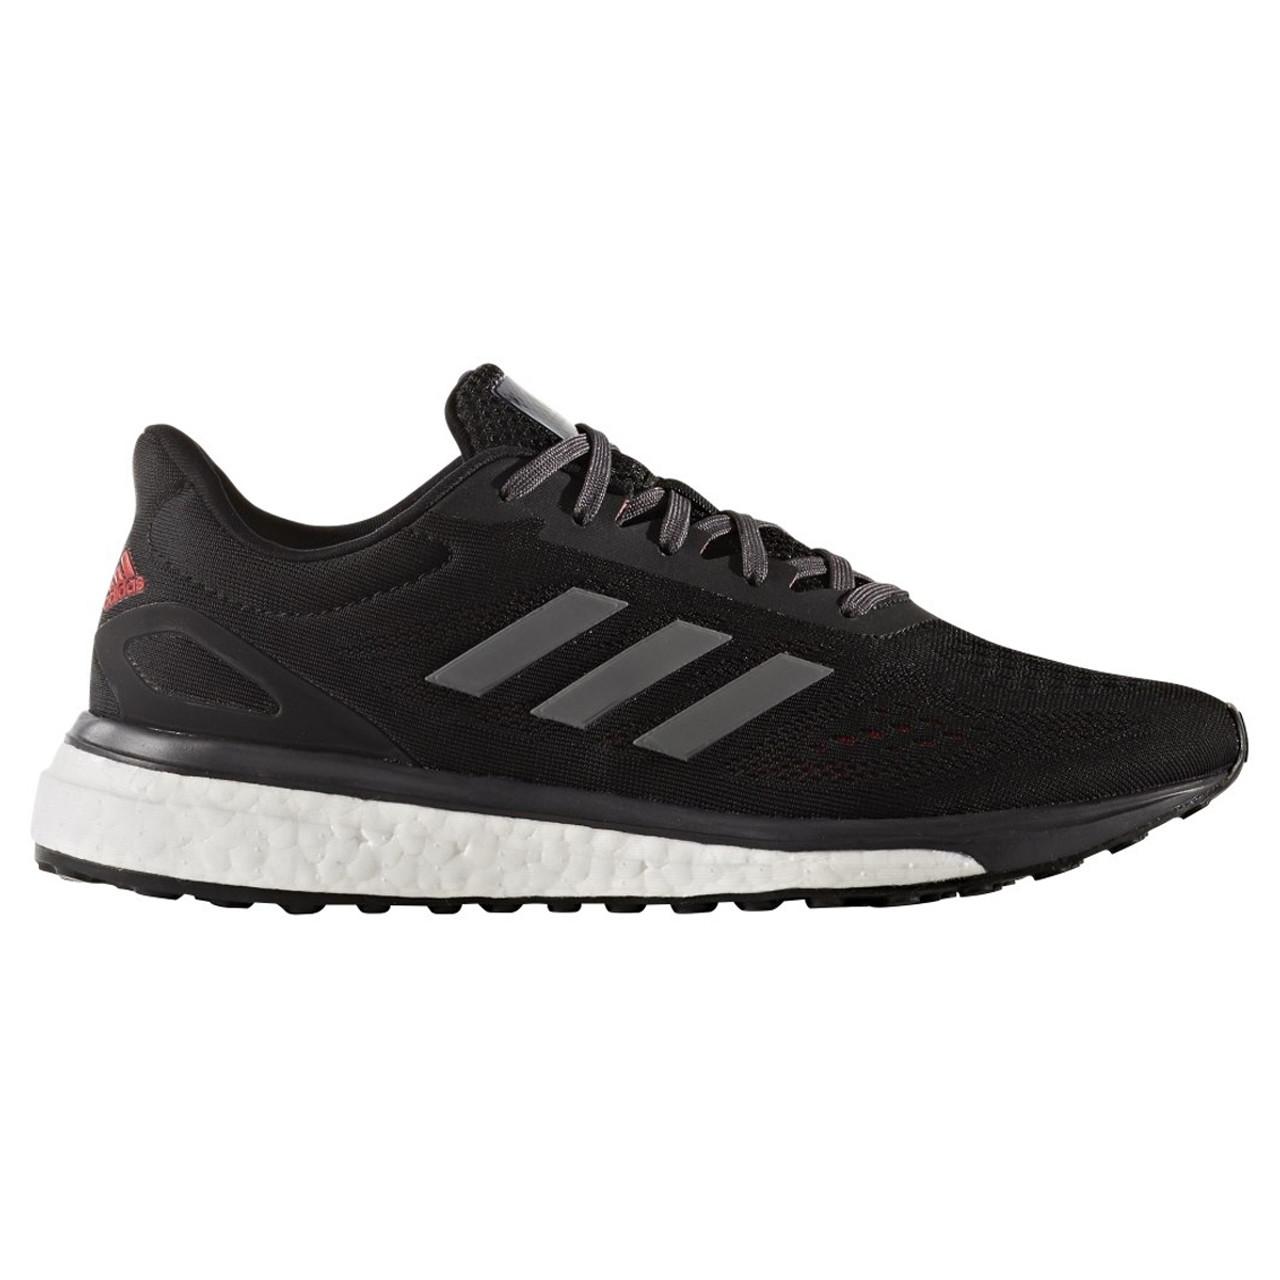 size 40 4953e a1c3c Adidas Sonic Drive Women s Running Shoes BB3424 - Black, ...